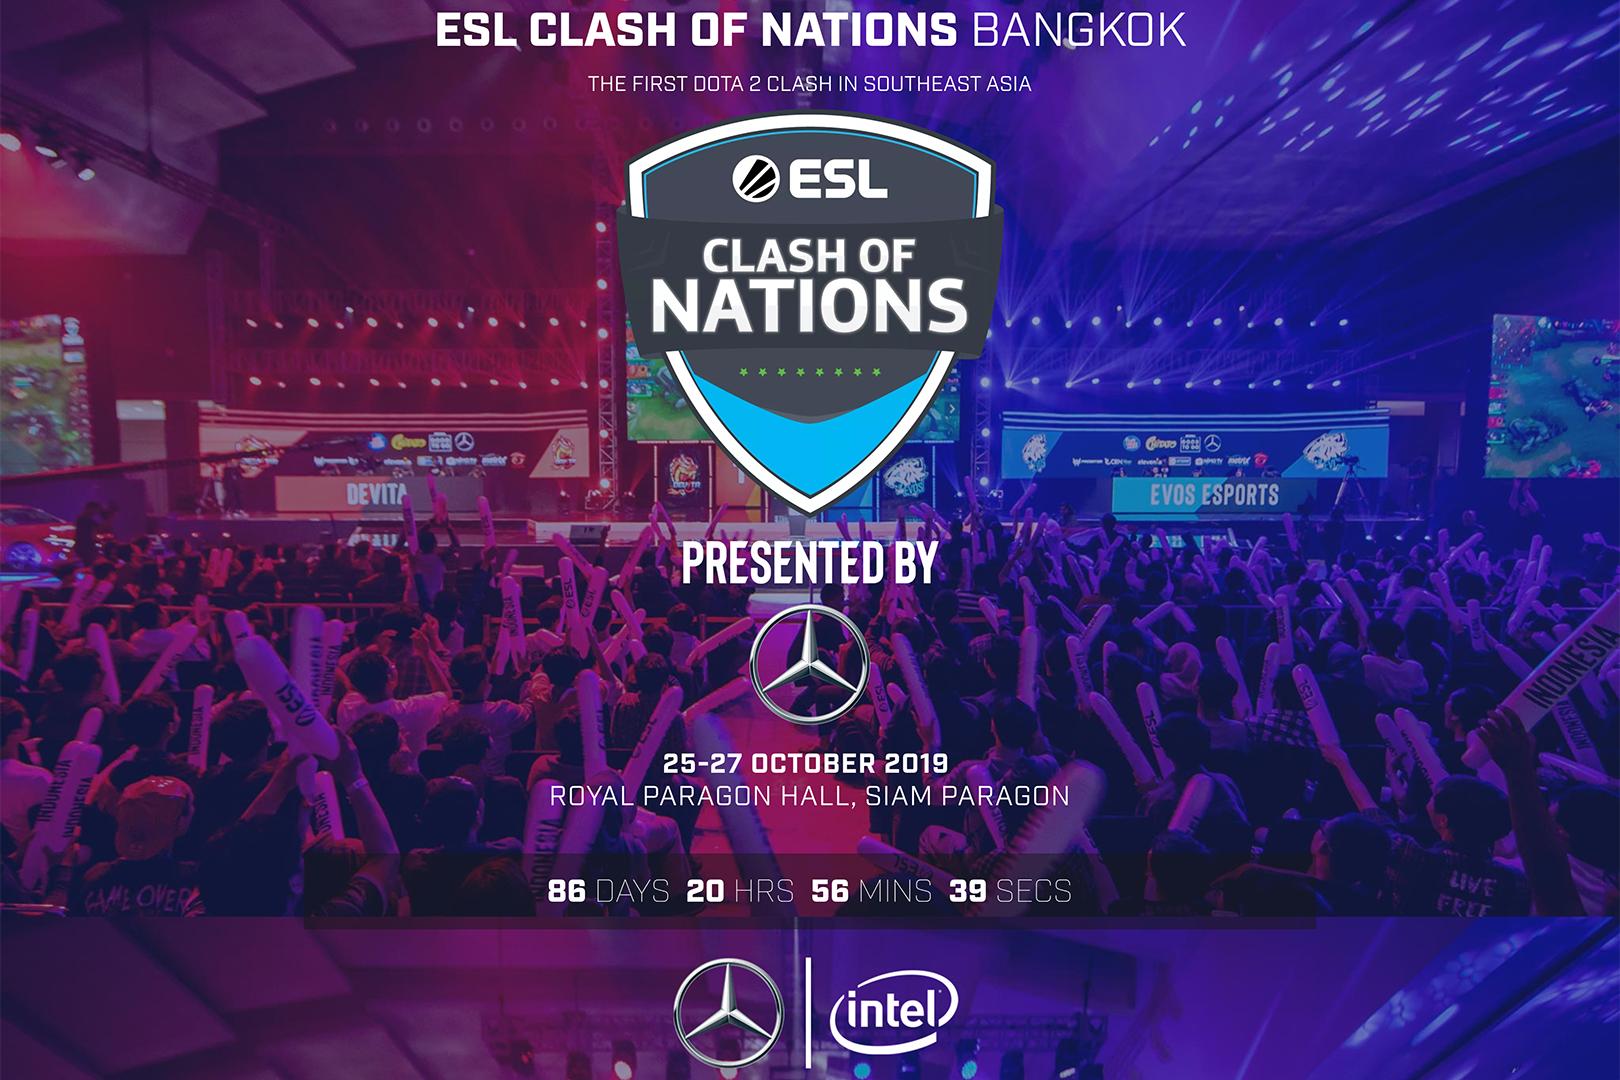 ESL Asia ยกสุดยอดการแข่งขัน Dota 2 มาจัดที่ประเทศไทยกับรายการ  ESL Clash of Nations Bangkok 2019, presented by Mercedes-Benz